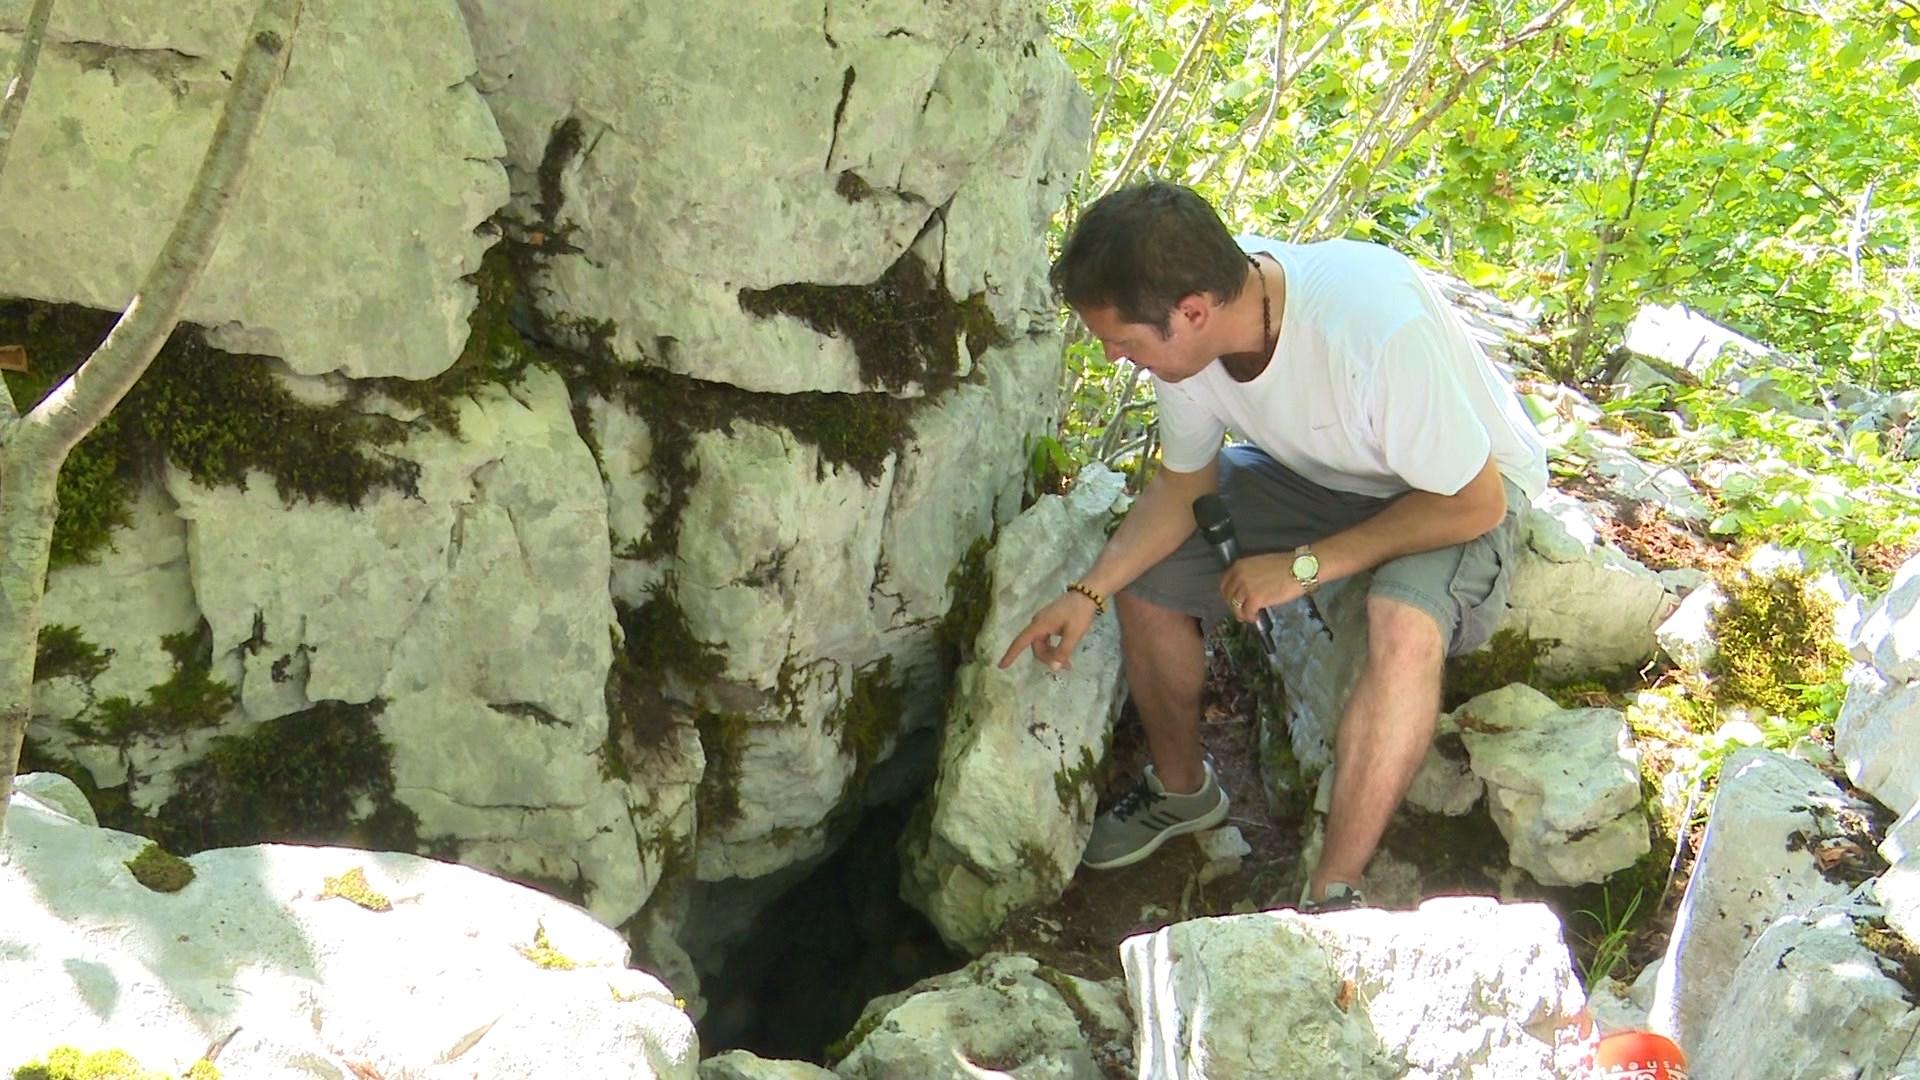 Keci i humbur zbulon shpellën ku iu fsheh regjimit albanologu Dom Nikollë Gazulli